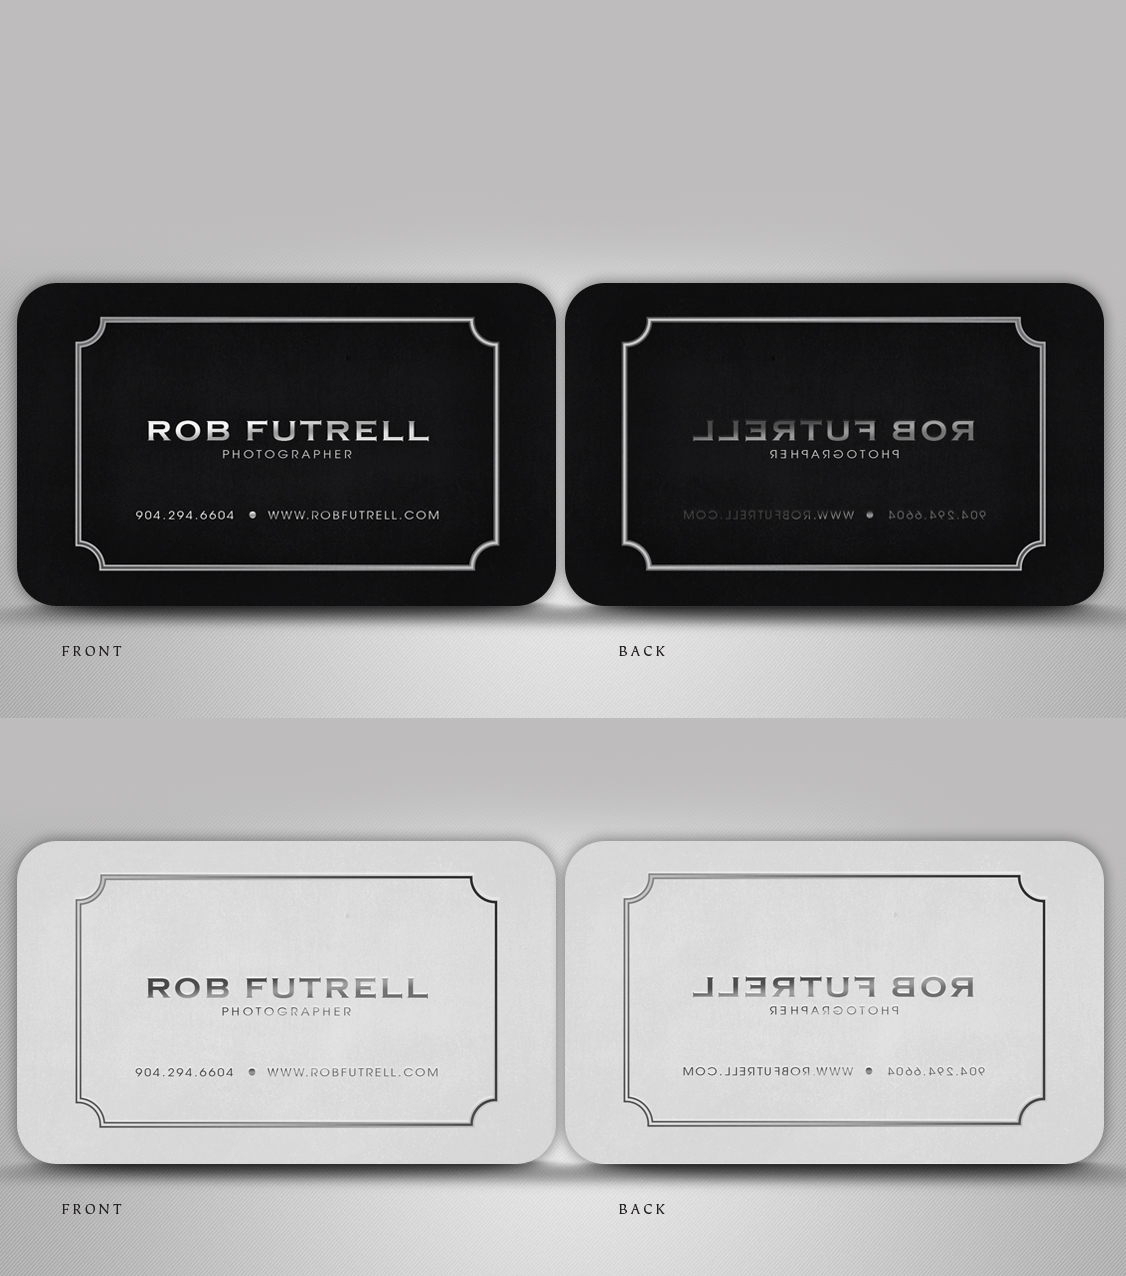 24 Serious Business Card Designs | Business Business Card Design ...